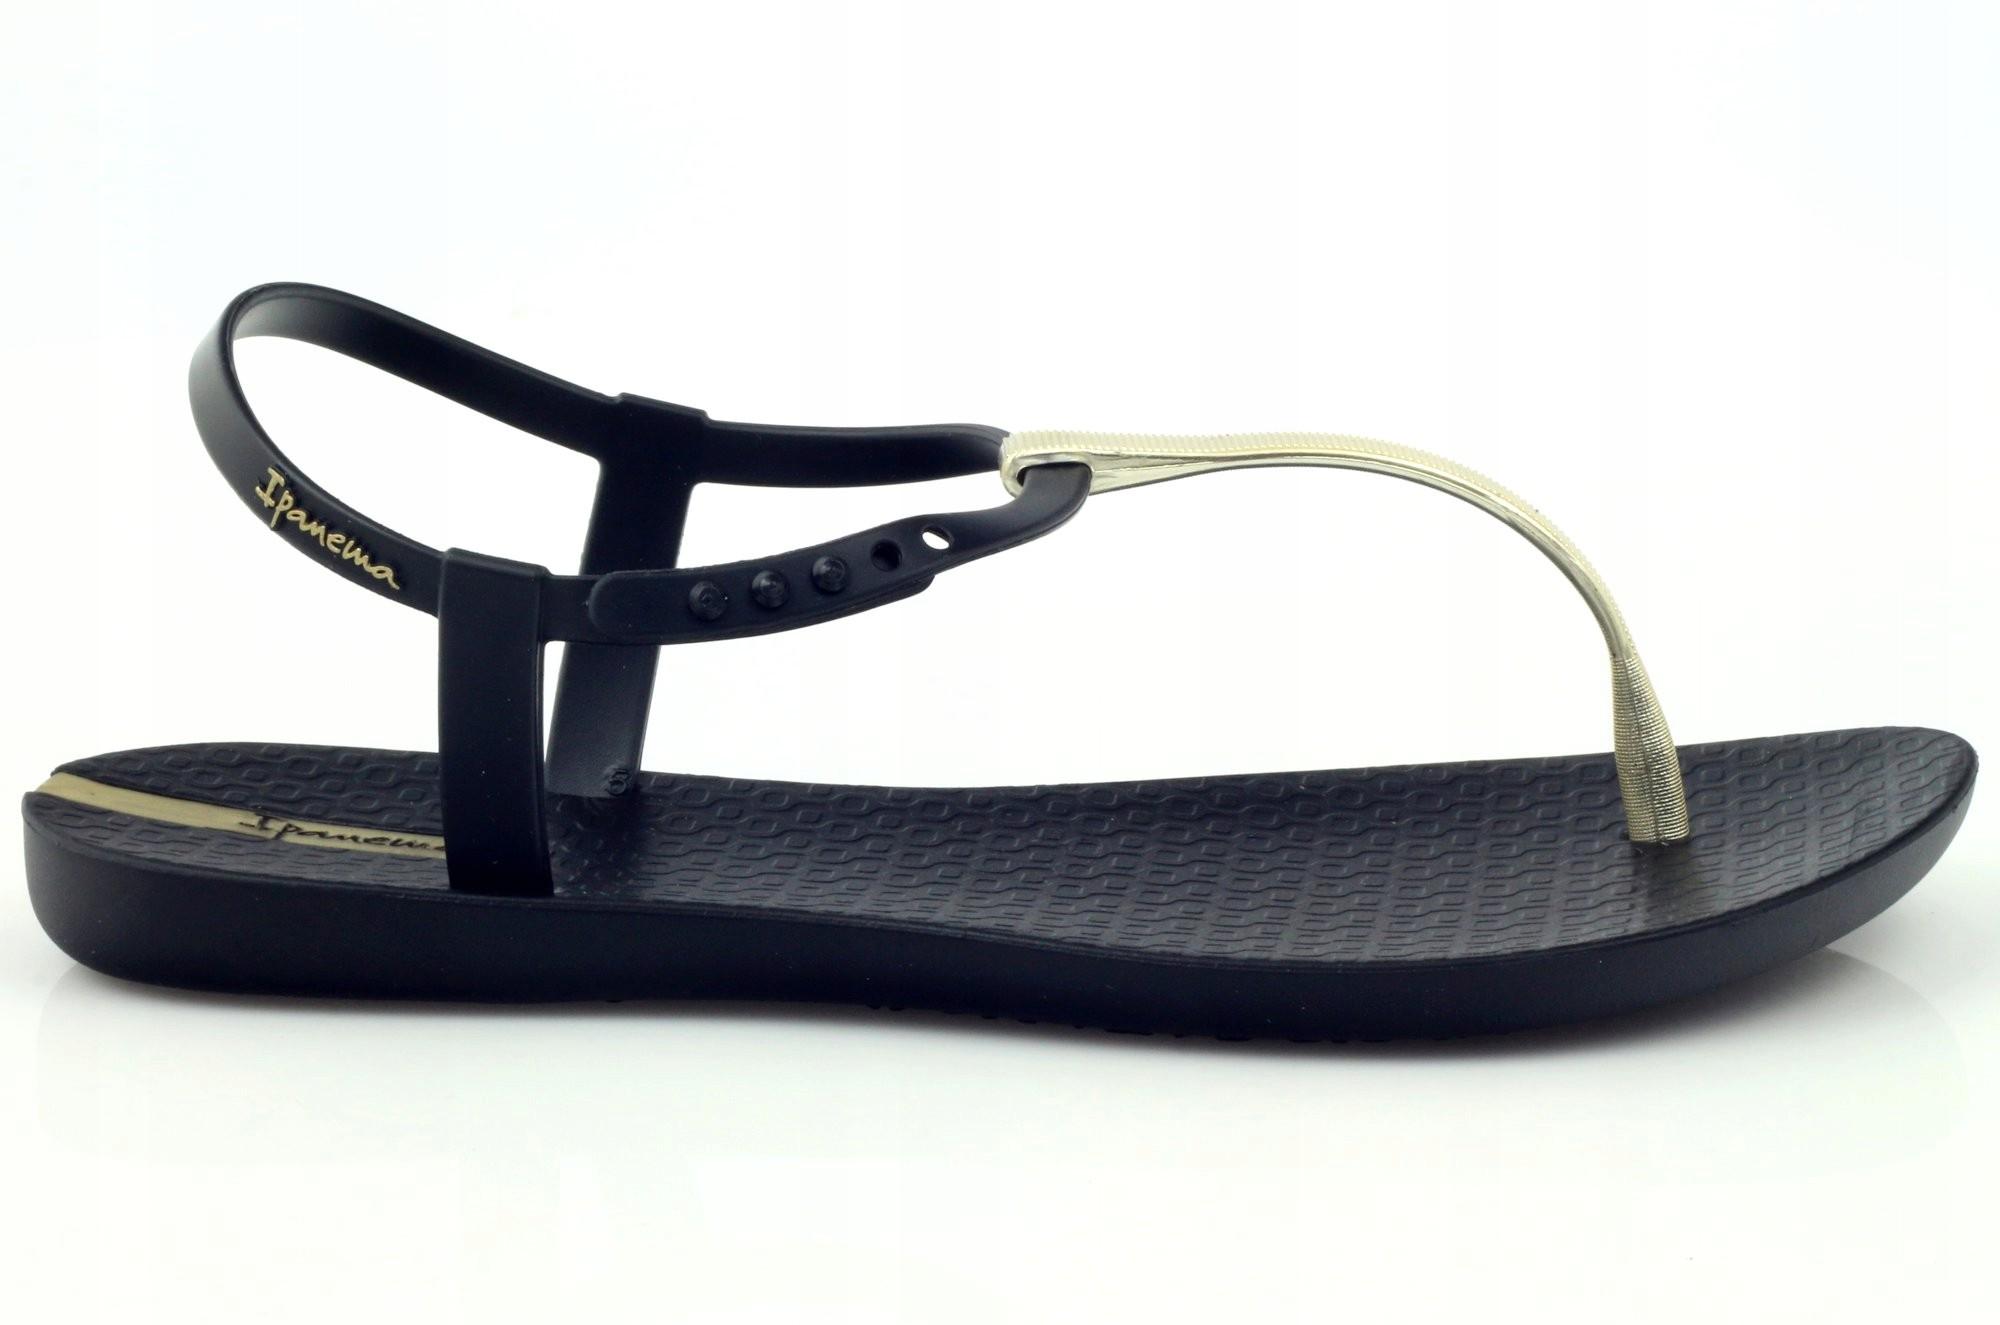 sandałki japonki adidas gumowe damskie granatowe